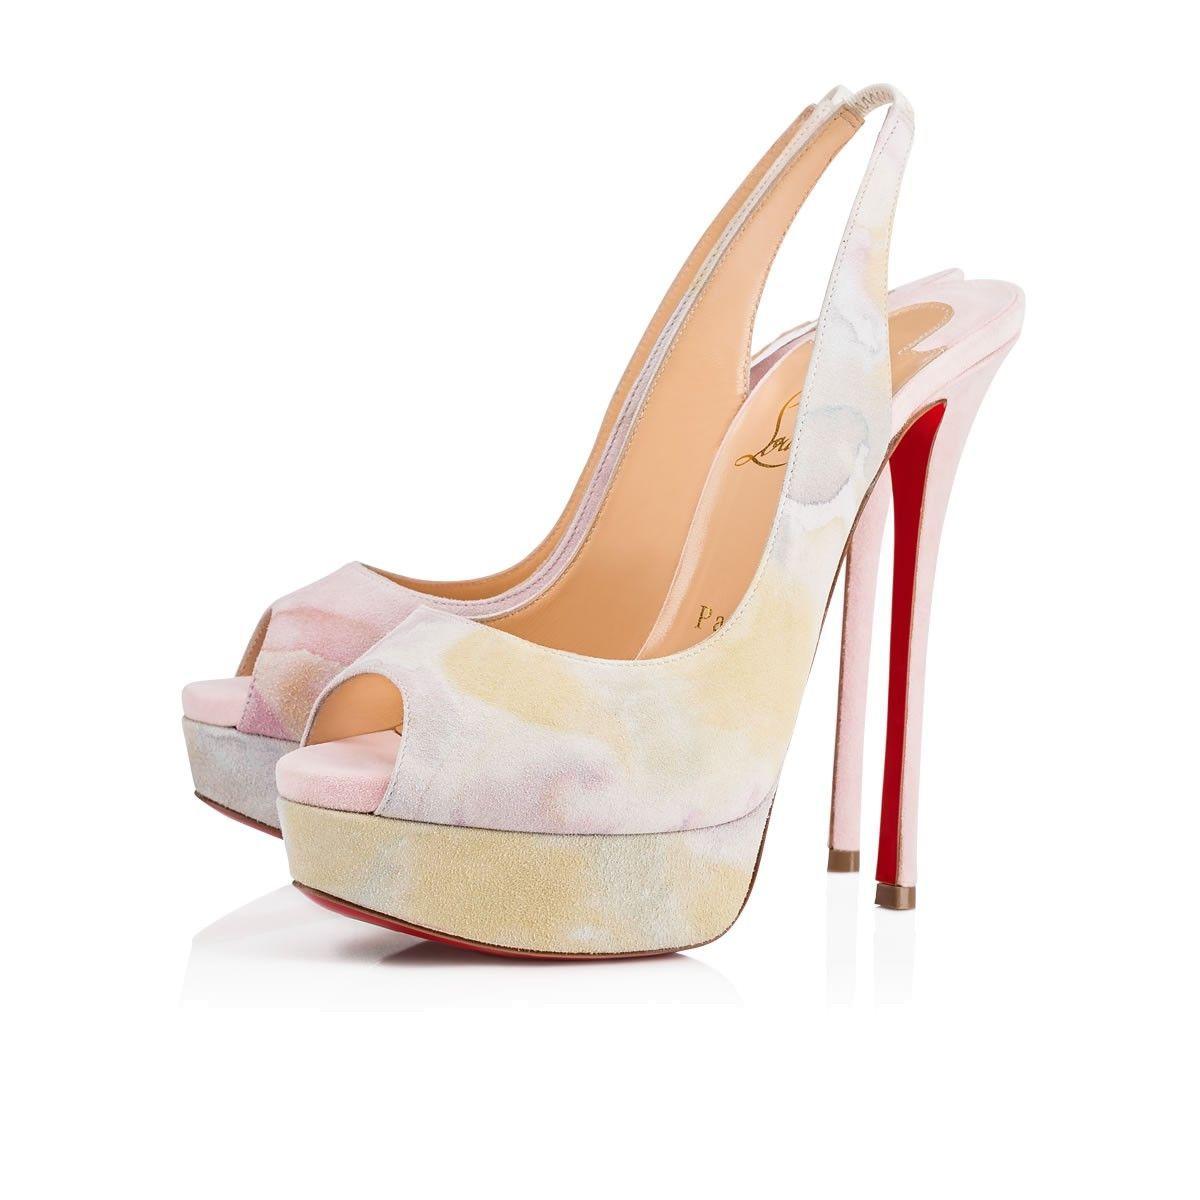 59a26be66746 Shoes - Fetish Peep Sling - Christian Louboutin